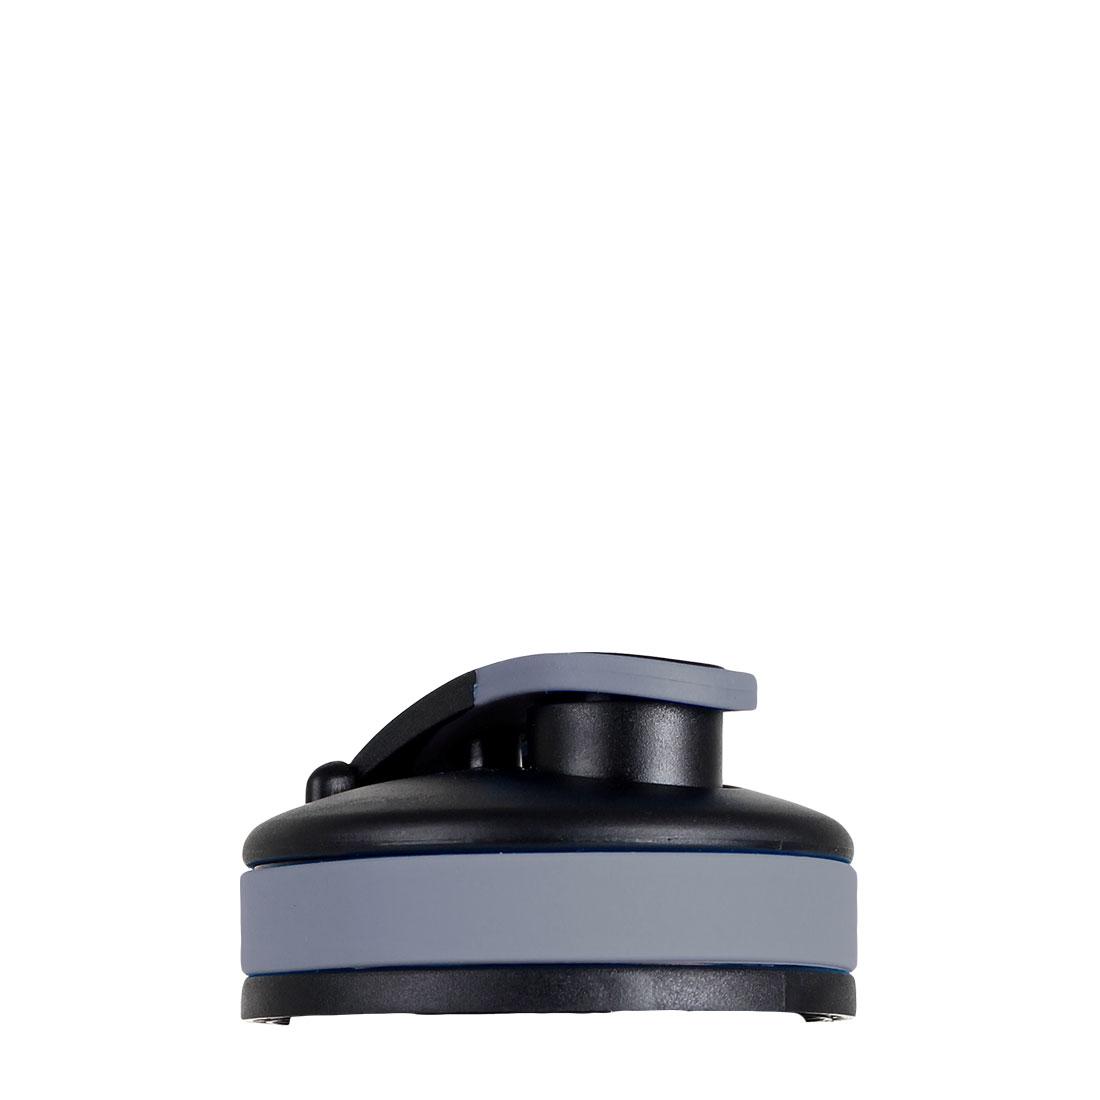 Ultralight 15l Compression Sack